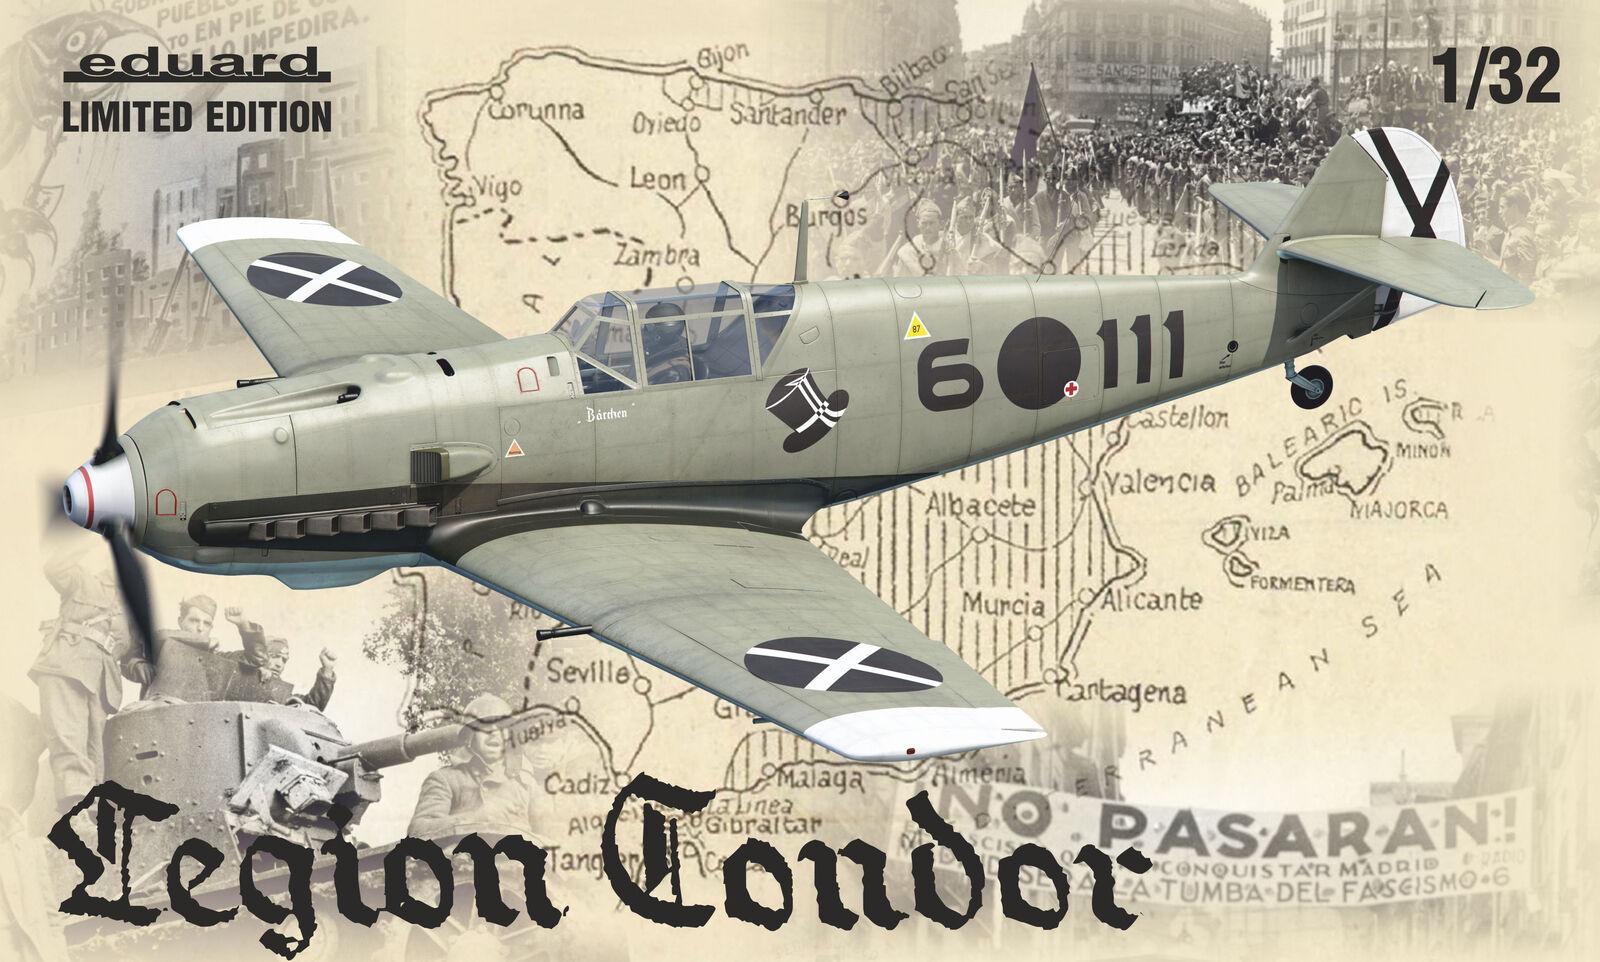 Eduard 1 32 Messerschmitt Bf-109E Legion Condor Edizione Limitata  K11105